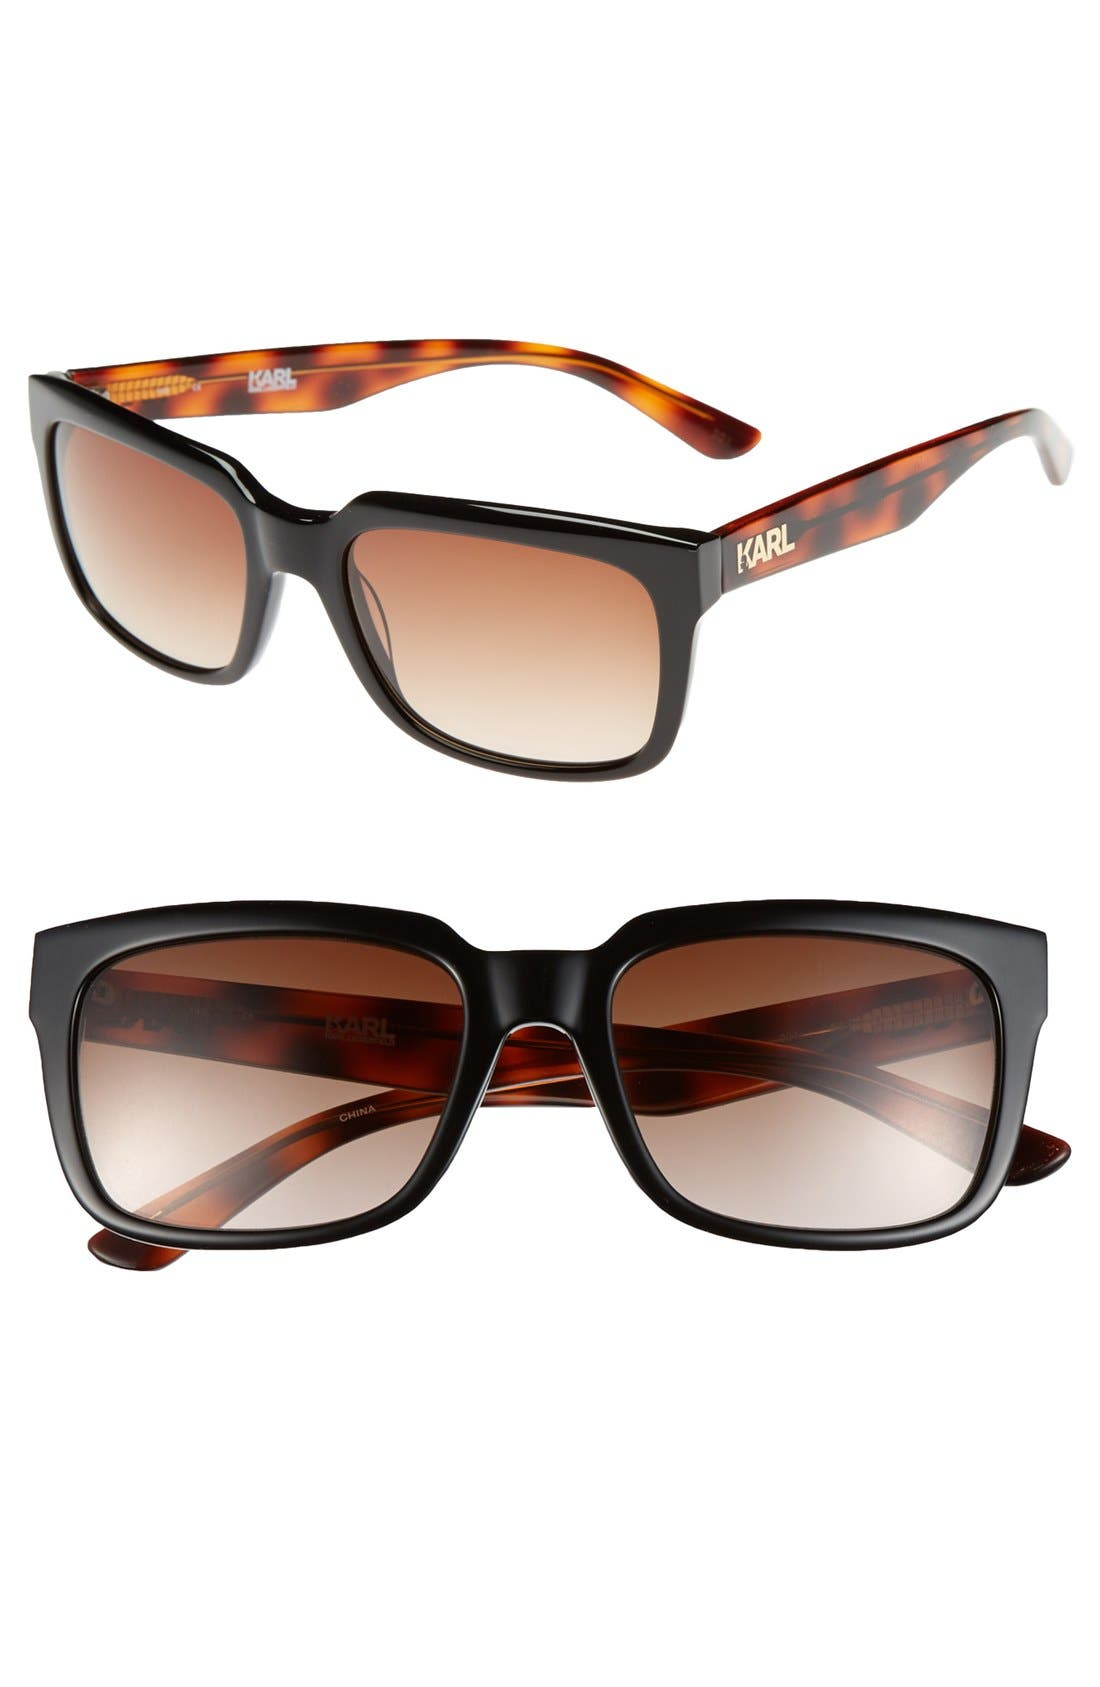 Alternate Image 1 Selected - Karl Lagerfeld 54mm Sunglasses